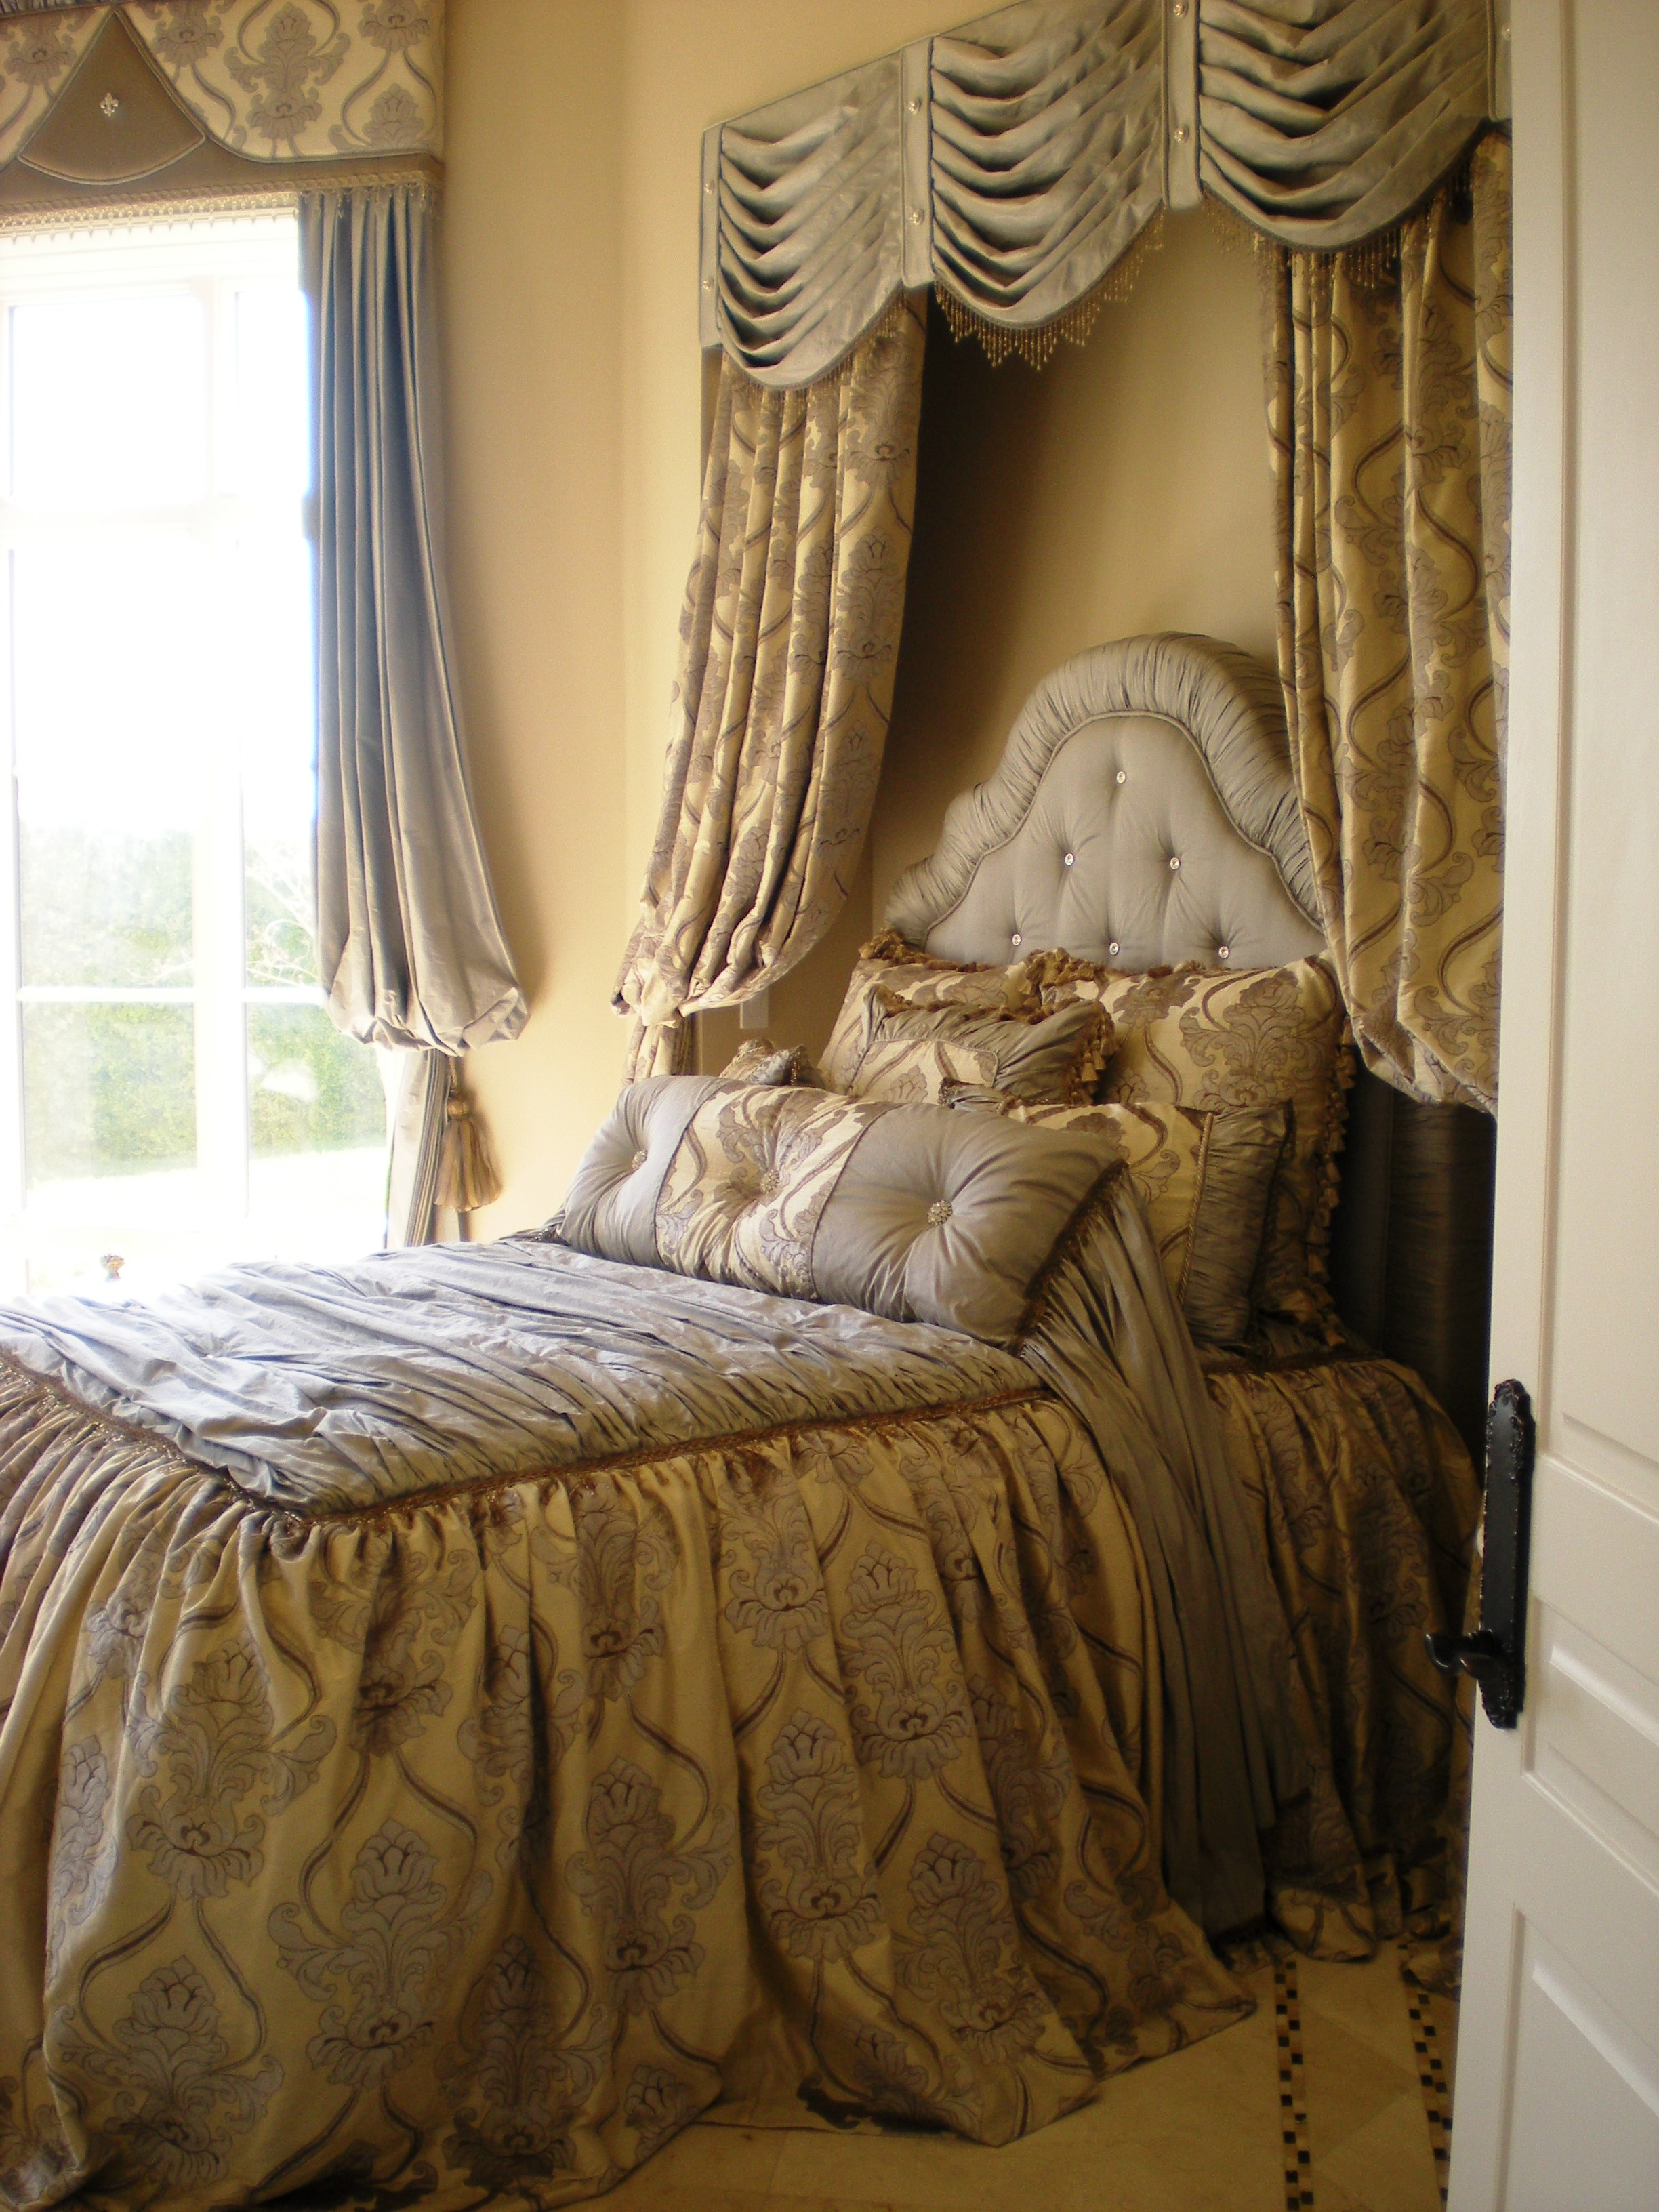 Canali Drapery Studio Custom Design Luxury Bedding and Pillows (11).JPG